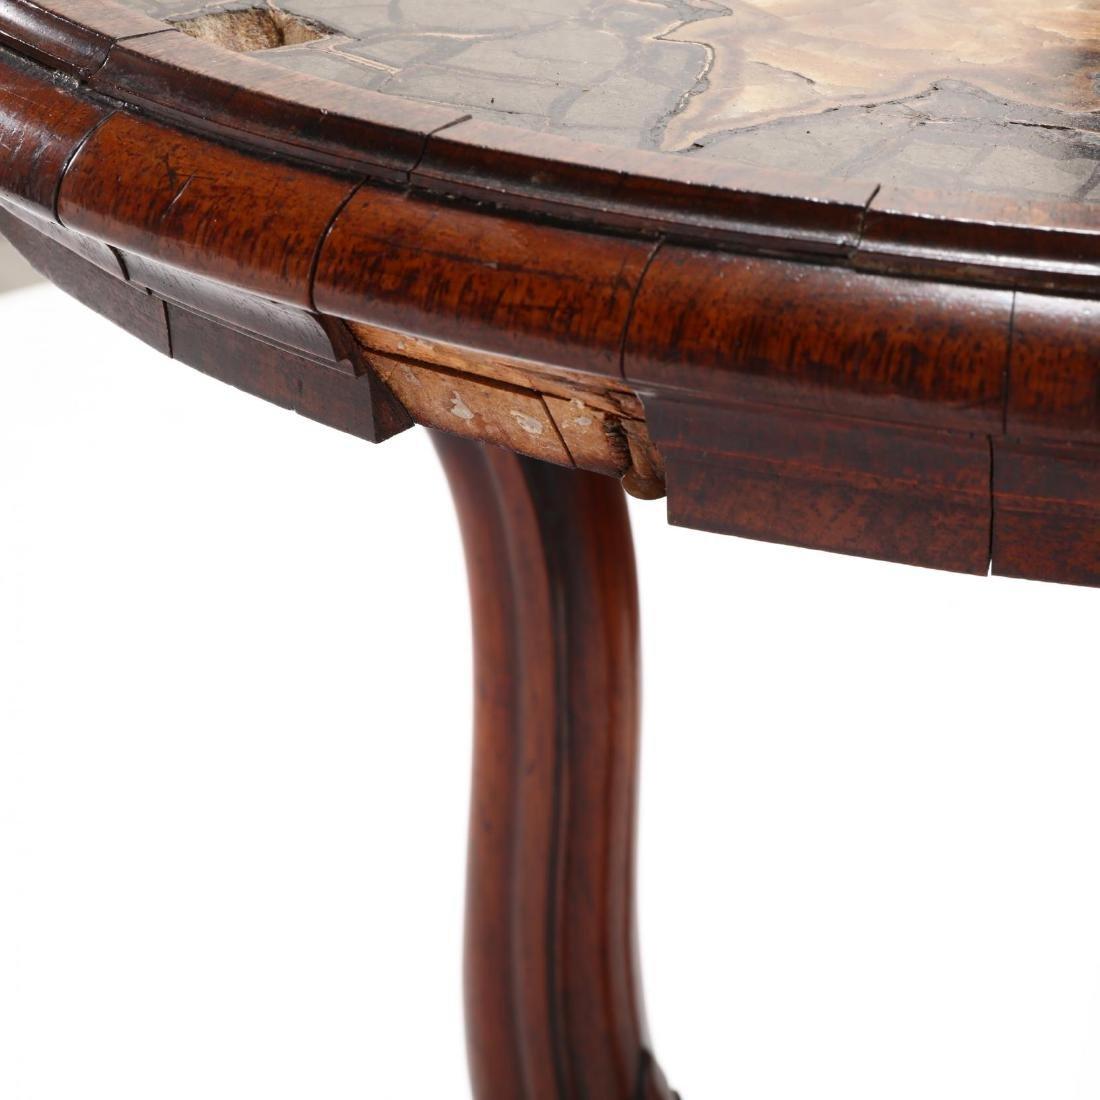 Italian Rococo Revival Specimen Top Parlour Table - 5